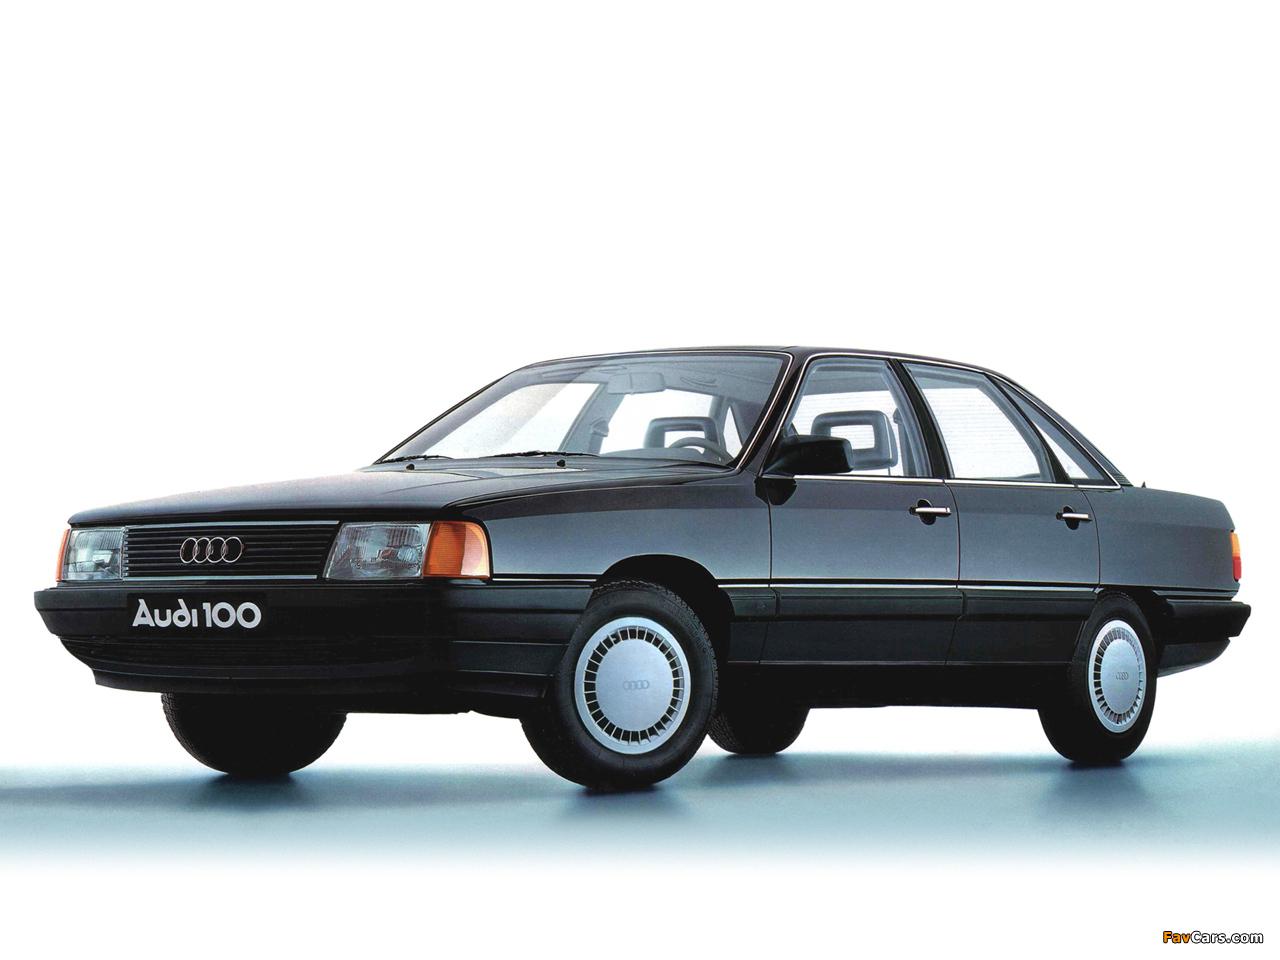 1982 Audi 100